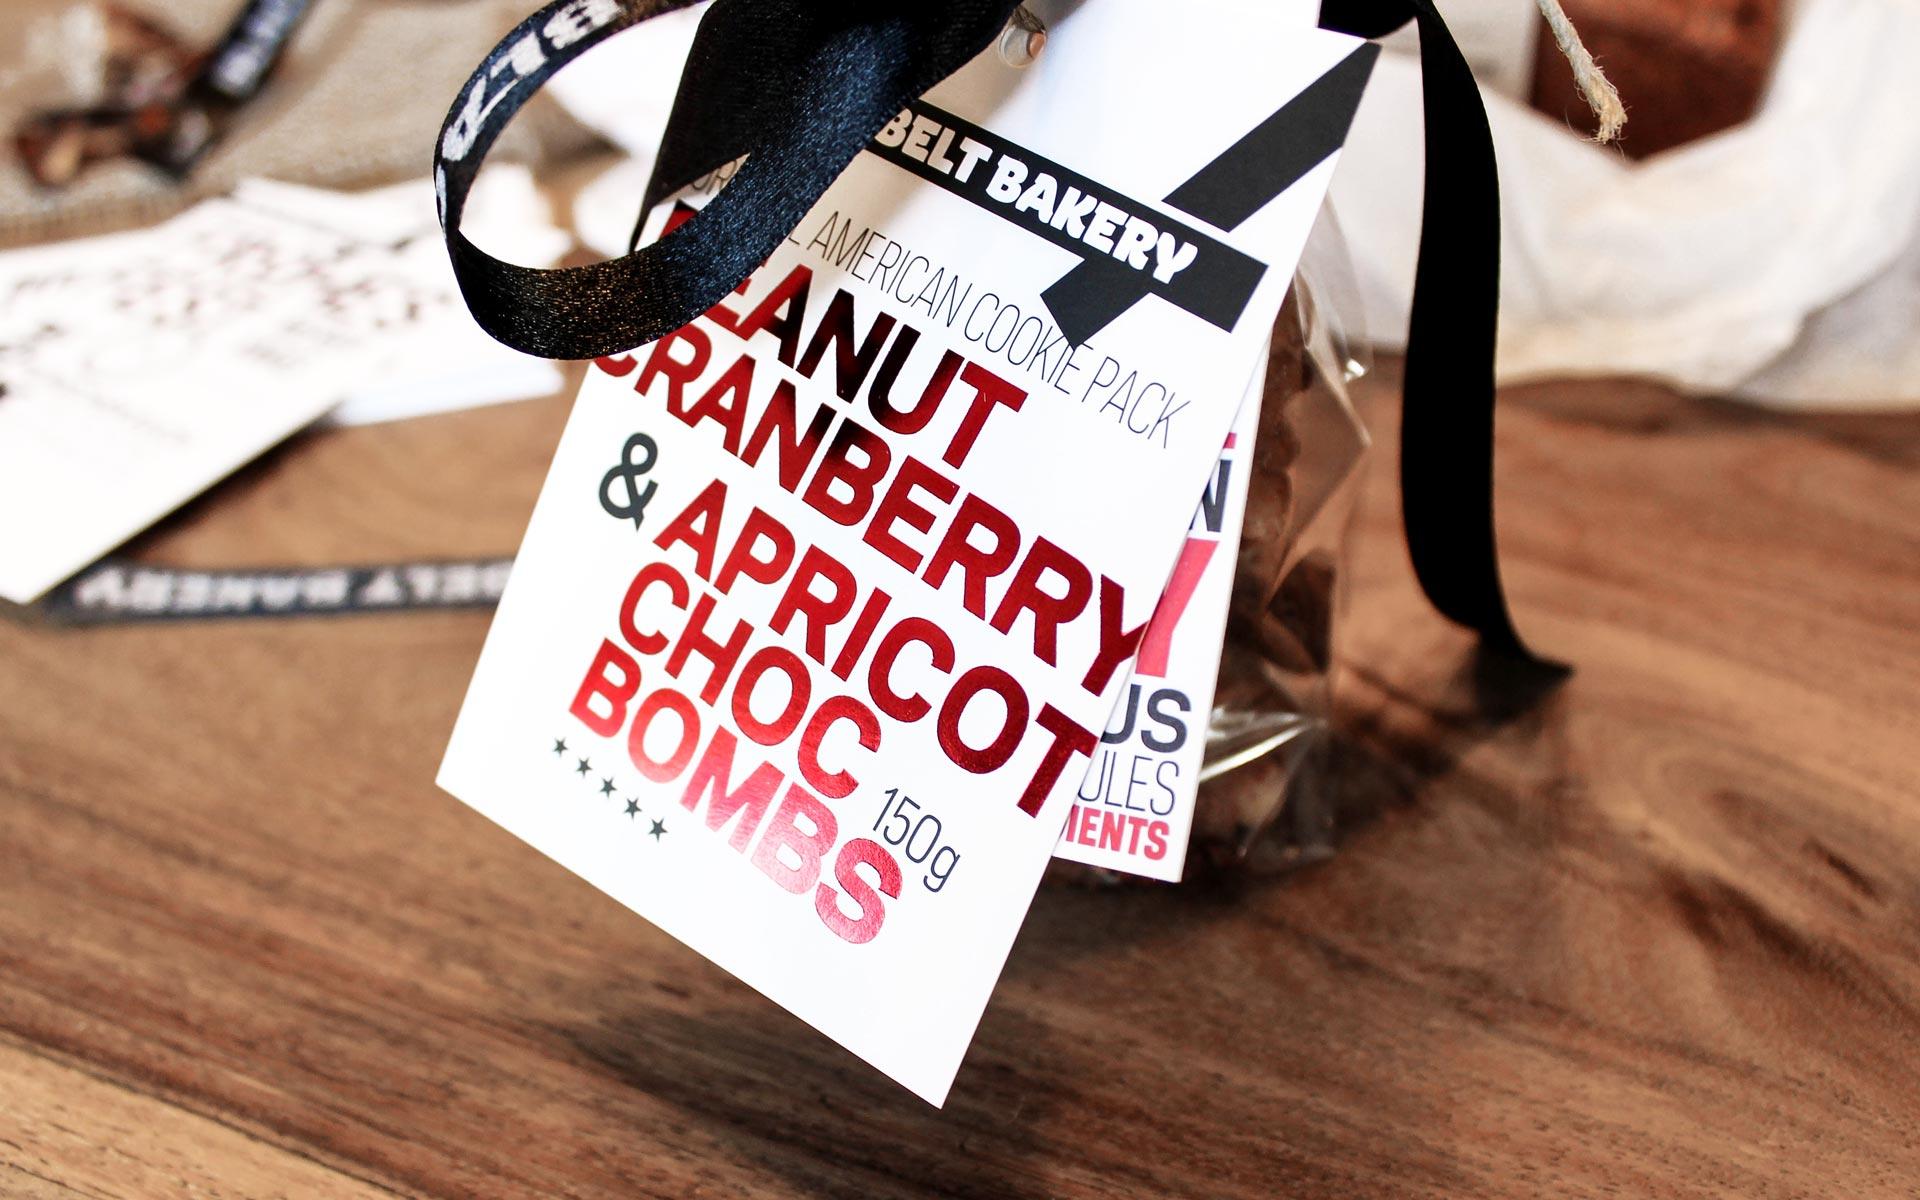 Black Belt Bakery Corporate Design, Verpackung, Hangtag in der Anwendung